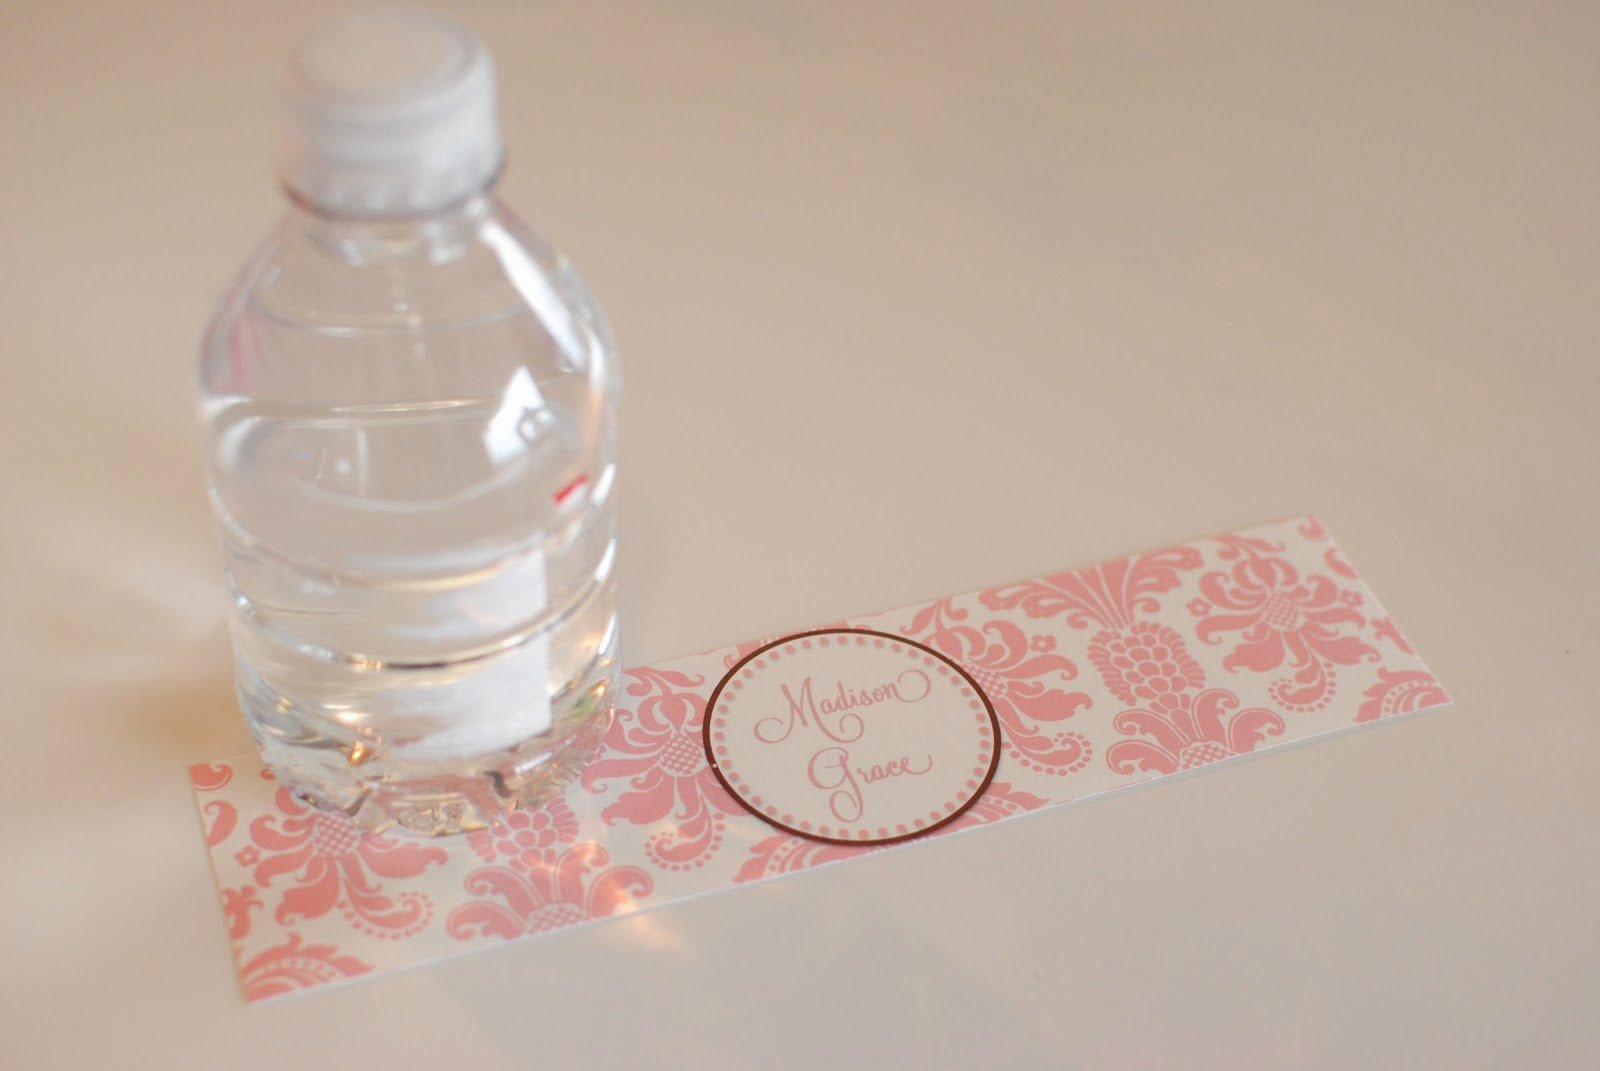 Diy Water Bottle Label Template Luxury Life Sweet Life Diy Printable Water Bottle Labels